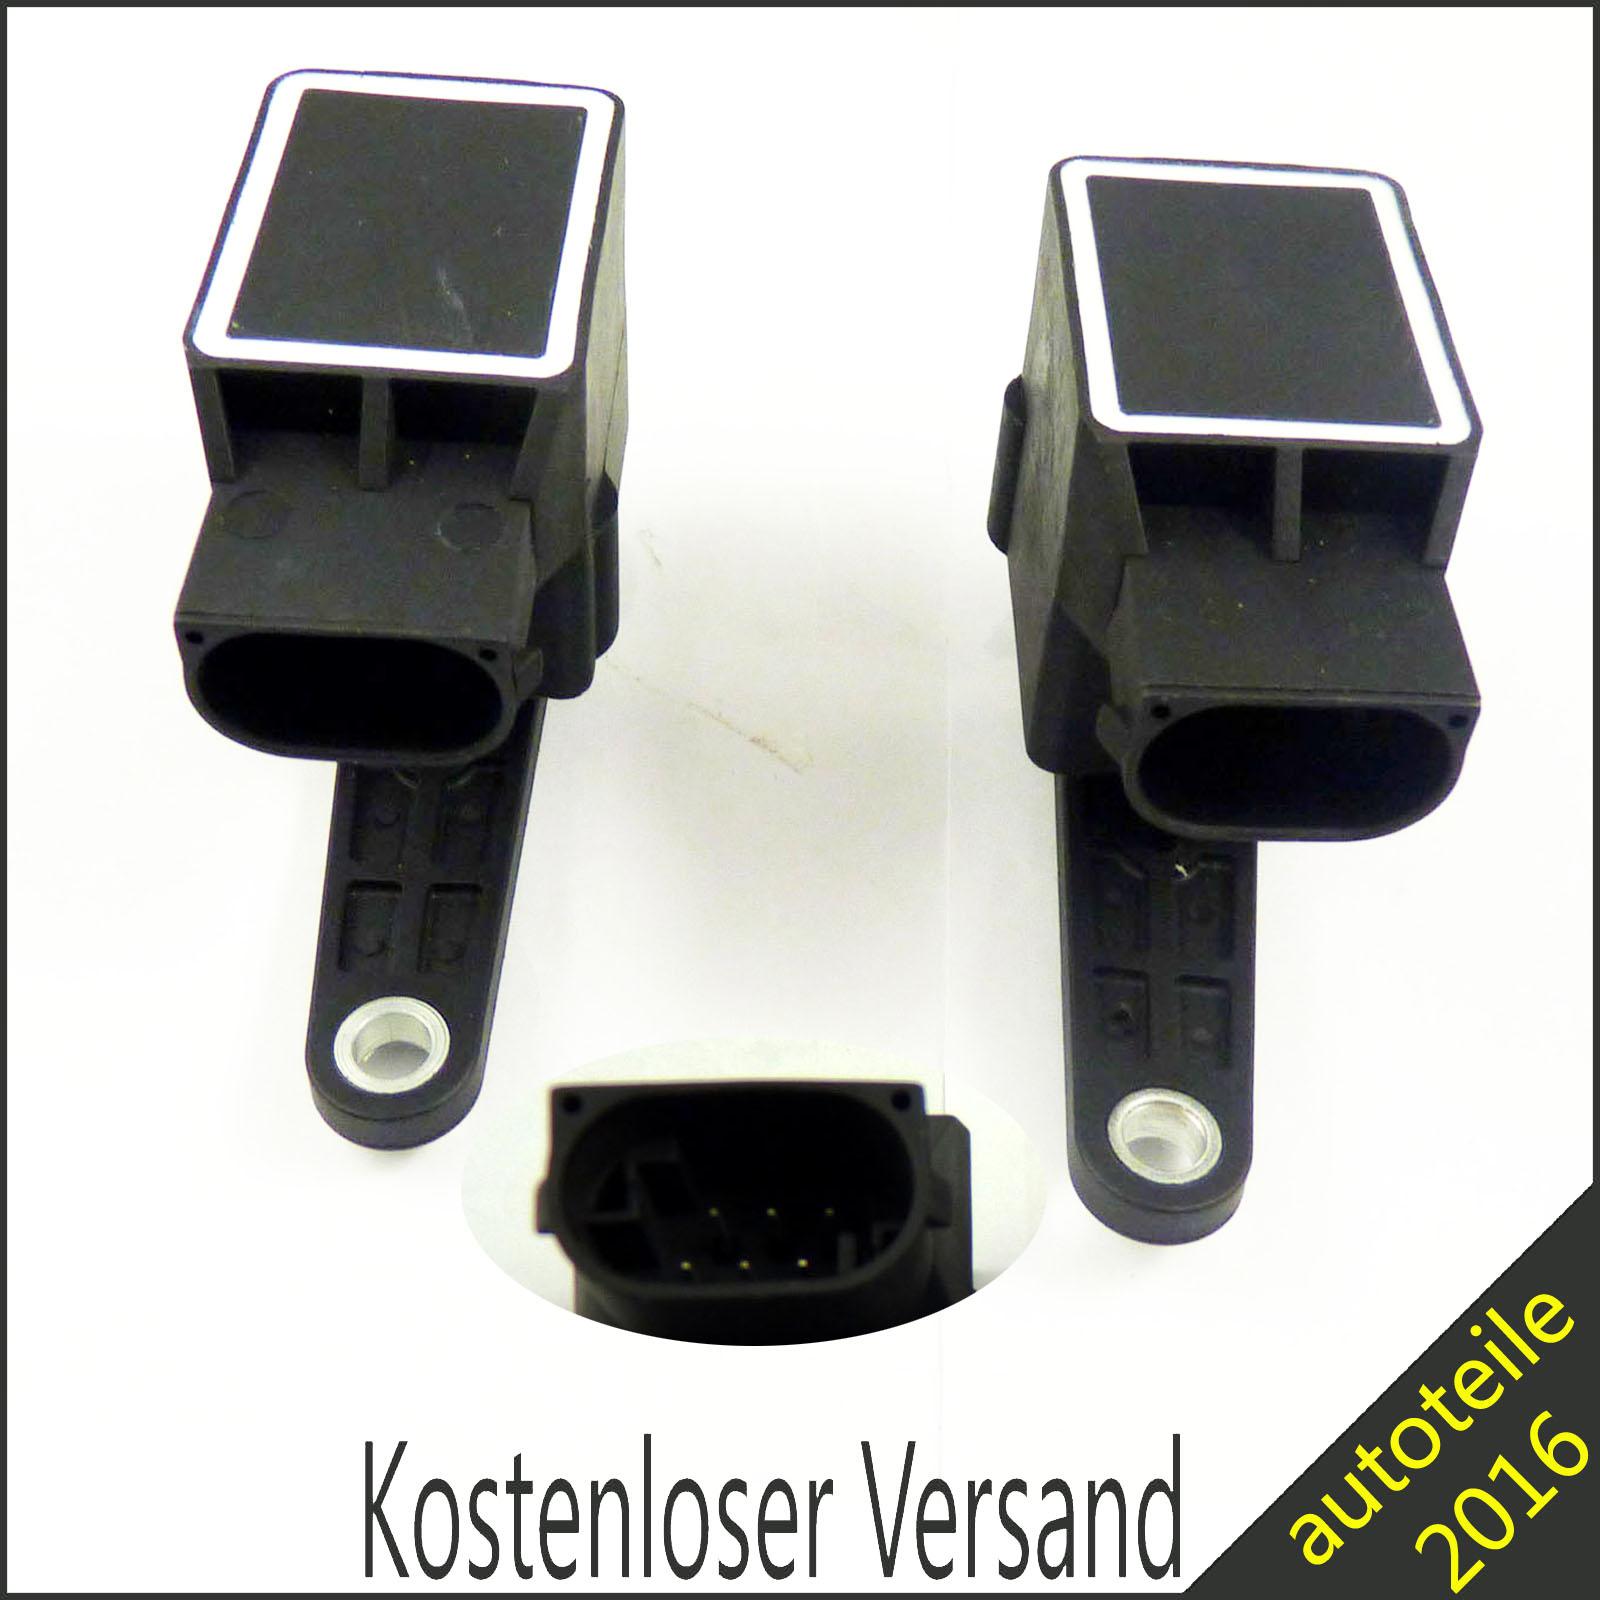 Leuchtweitensensor Xenon Sensor Hinten /& Vorne für BMW X3 Z4 5er E39 E60 3er E46